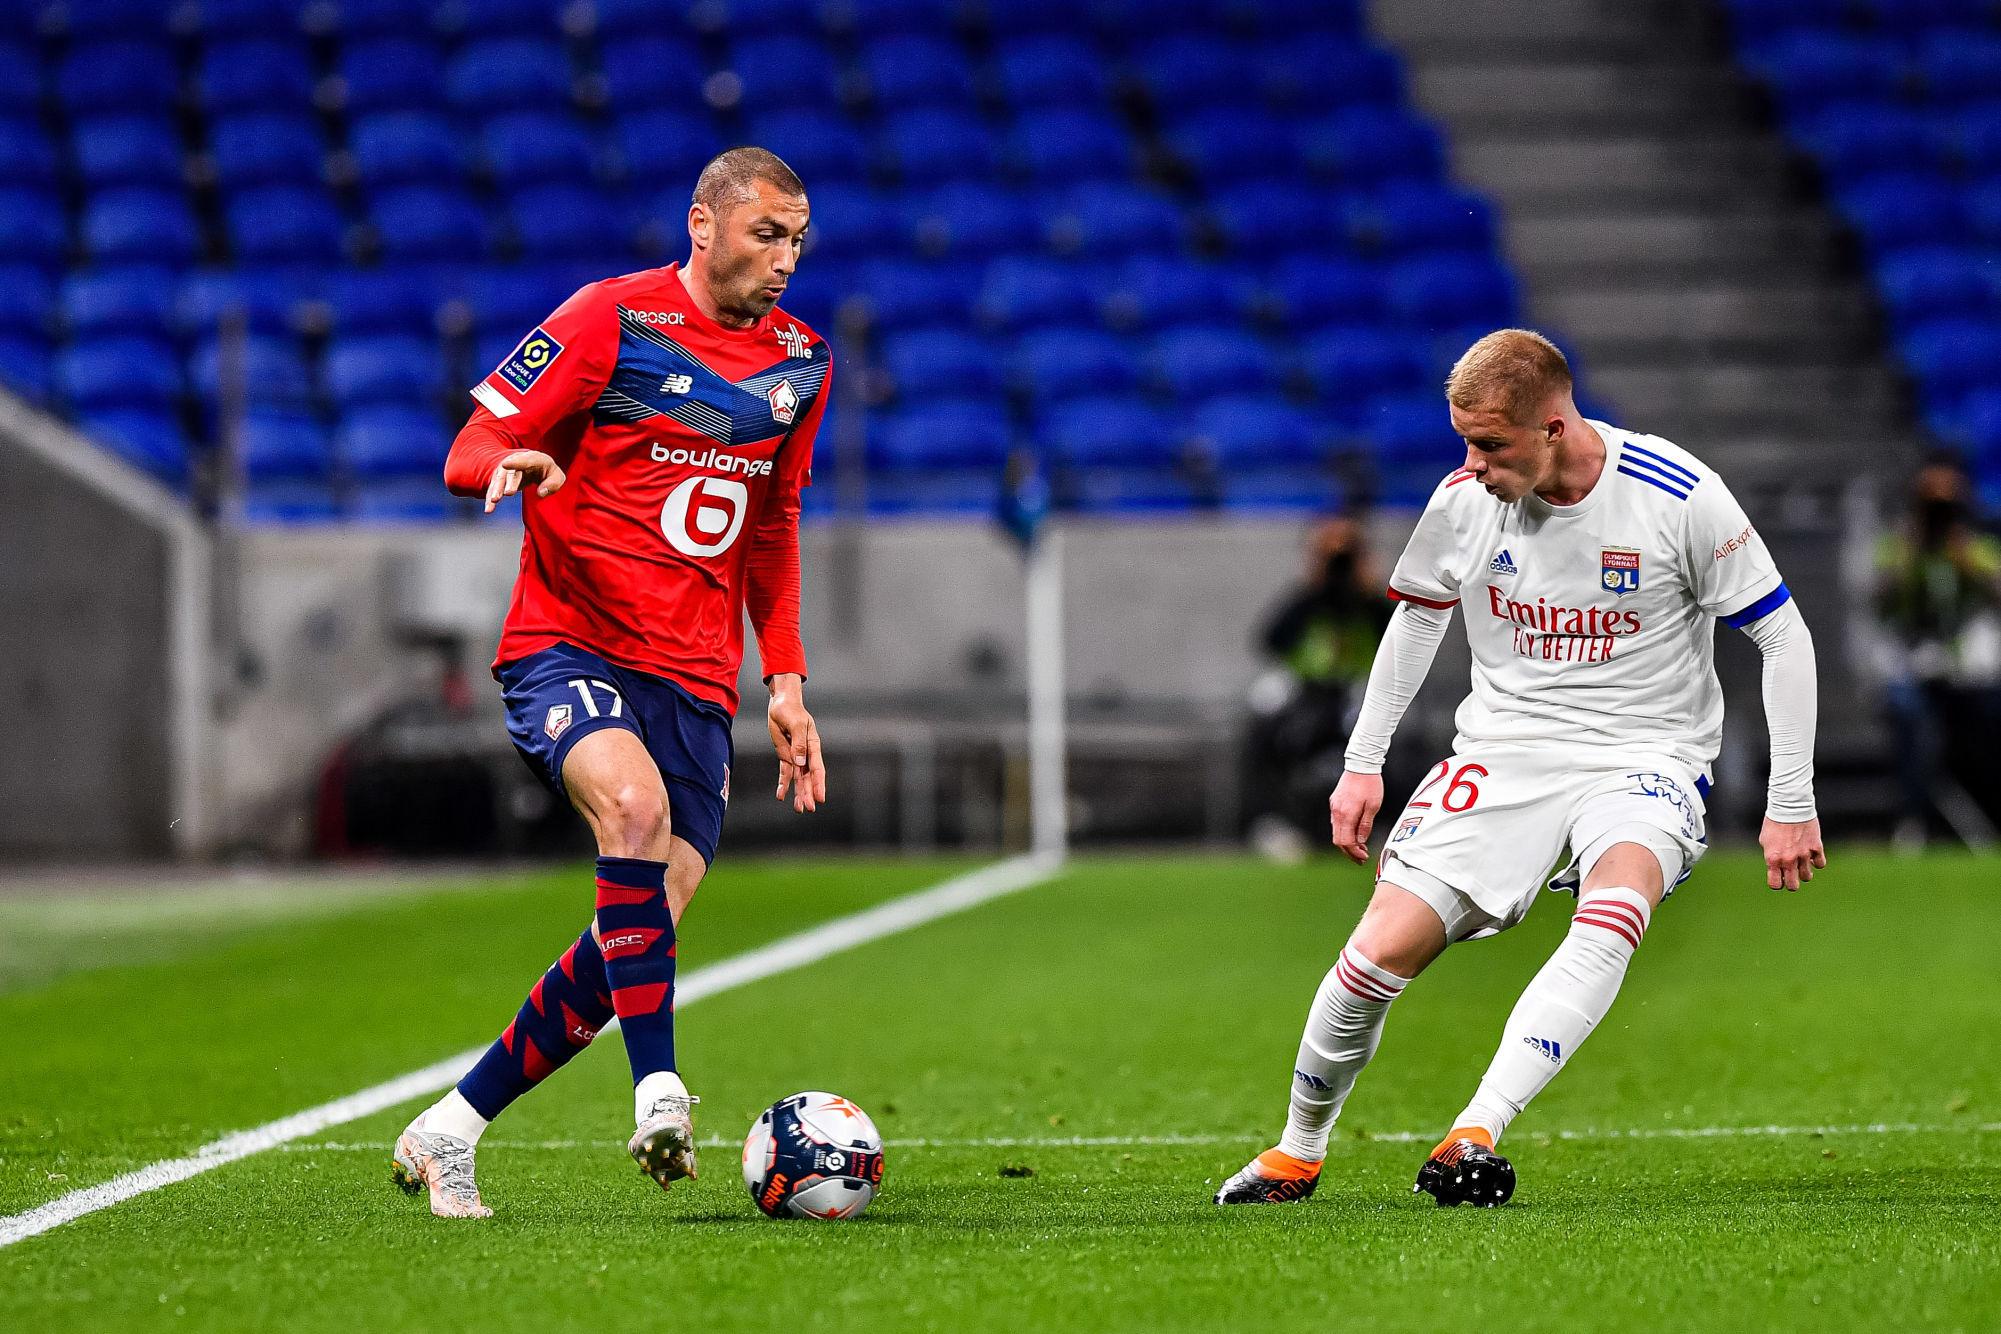 Melvin BARD quitte l'Olympique Lyonnais…